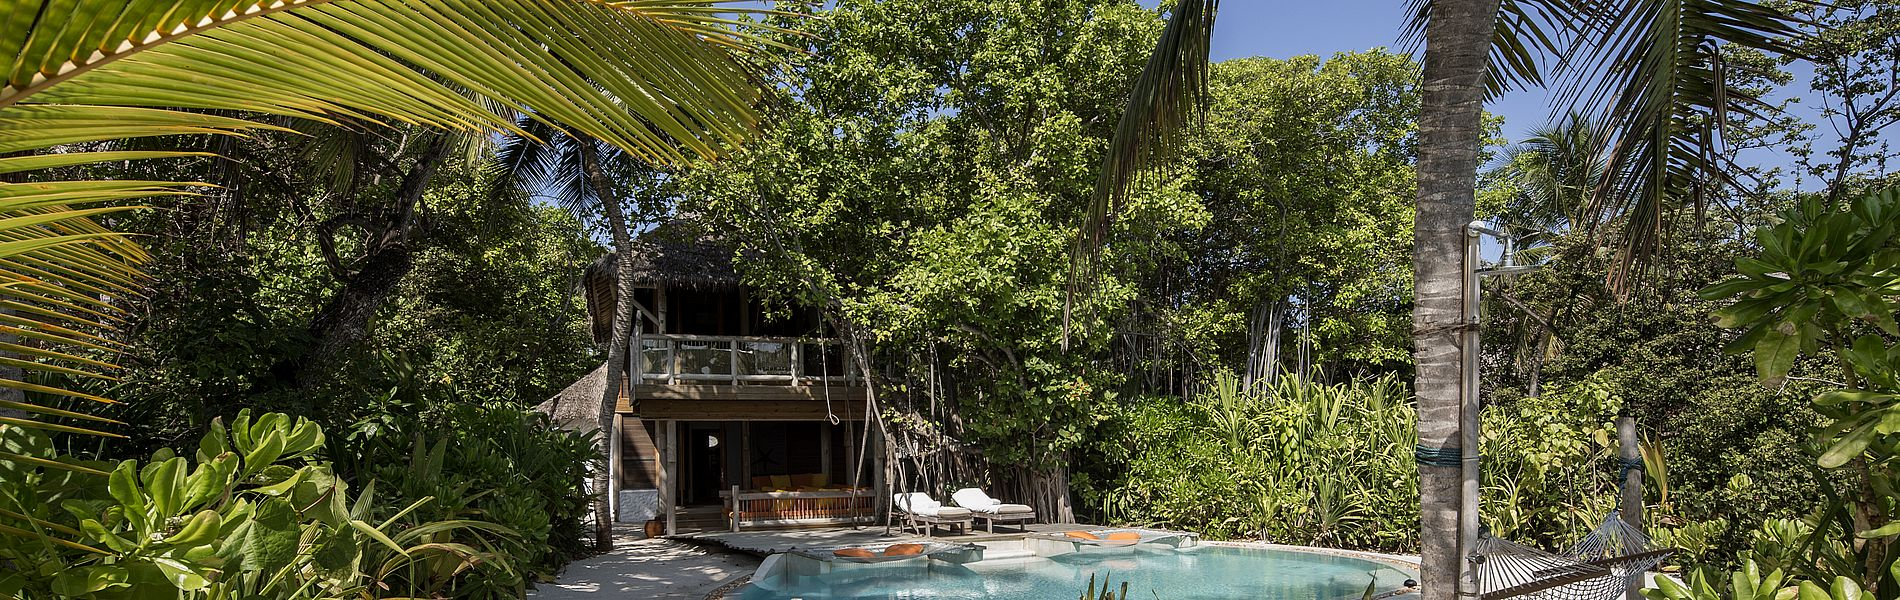 Soneva Fushi Malediven, Villa 16 im Dschungel, mit privatem Pool